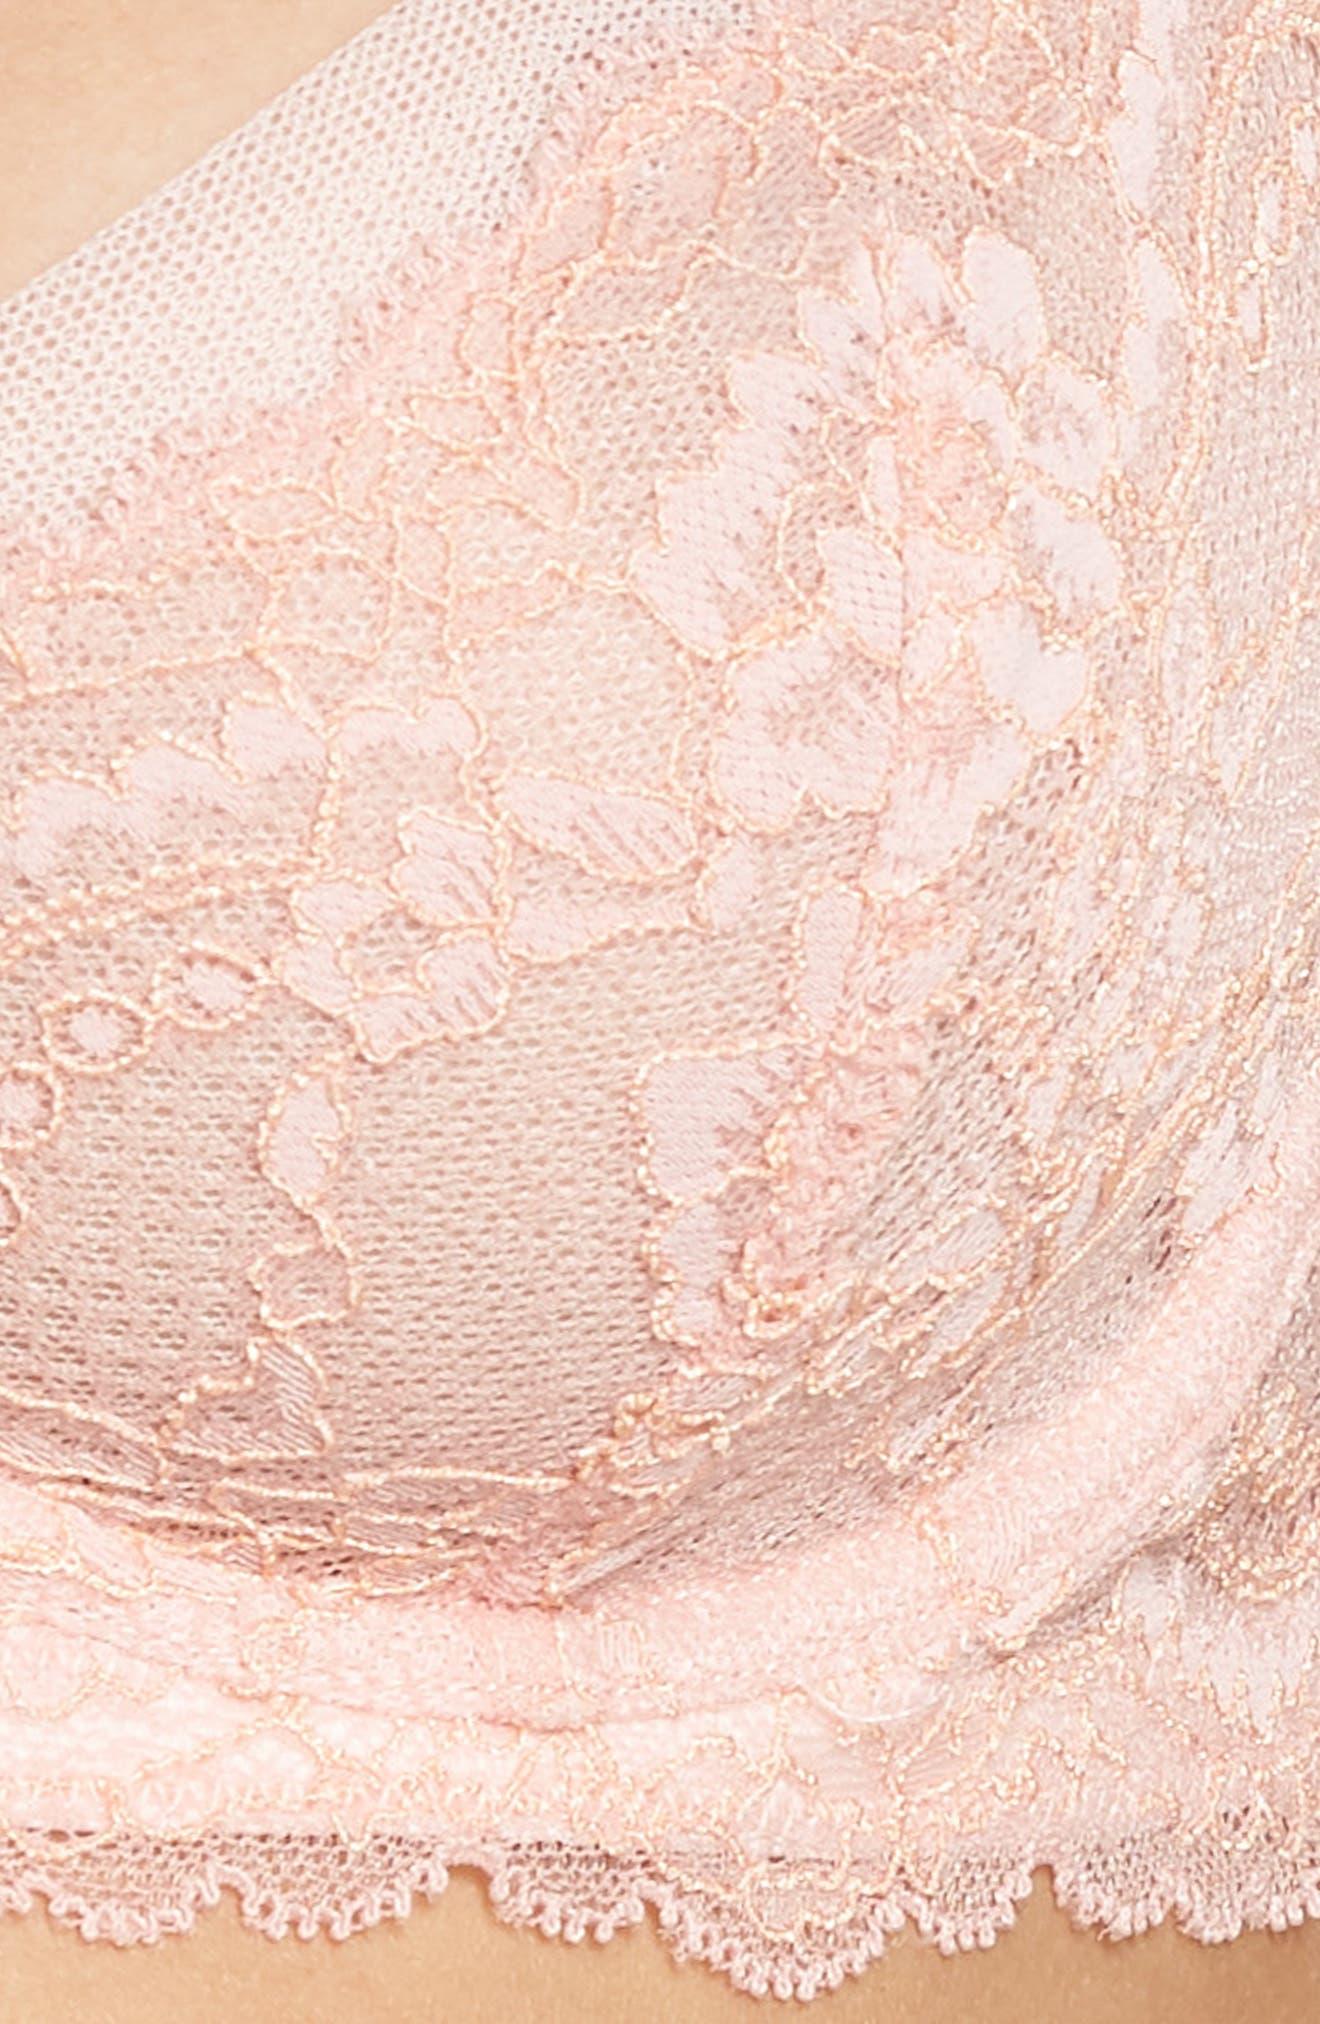 SKARLETT BLUE,                             'Minx' Unlined Lace Demi Underwire Bra,                             Alternate thumbnail 6, color,                             ROSE/ BELLINI